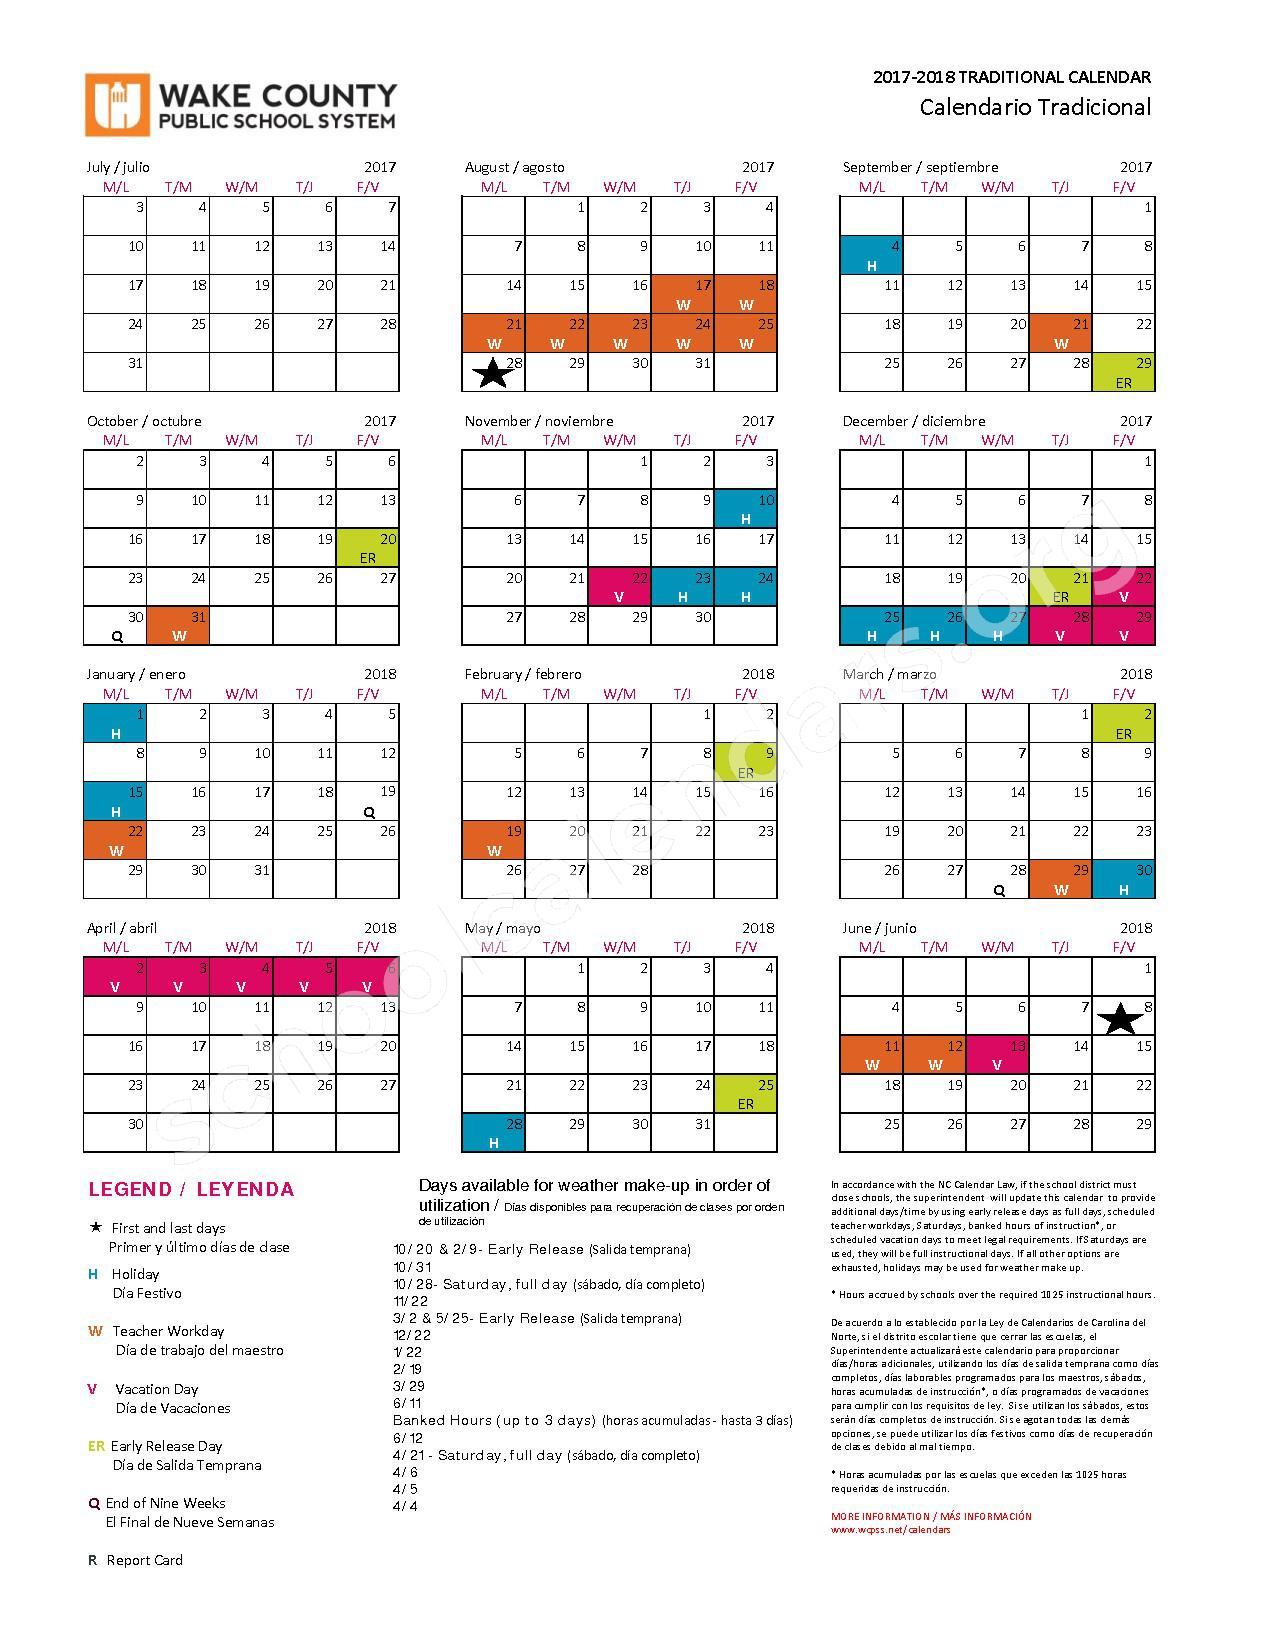 2017 - 2018 Traditional Calendar | Wake County Public Inside Wake County Nc Track Schedule Calendar